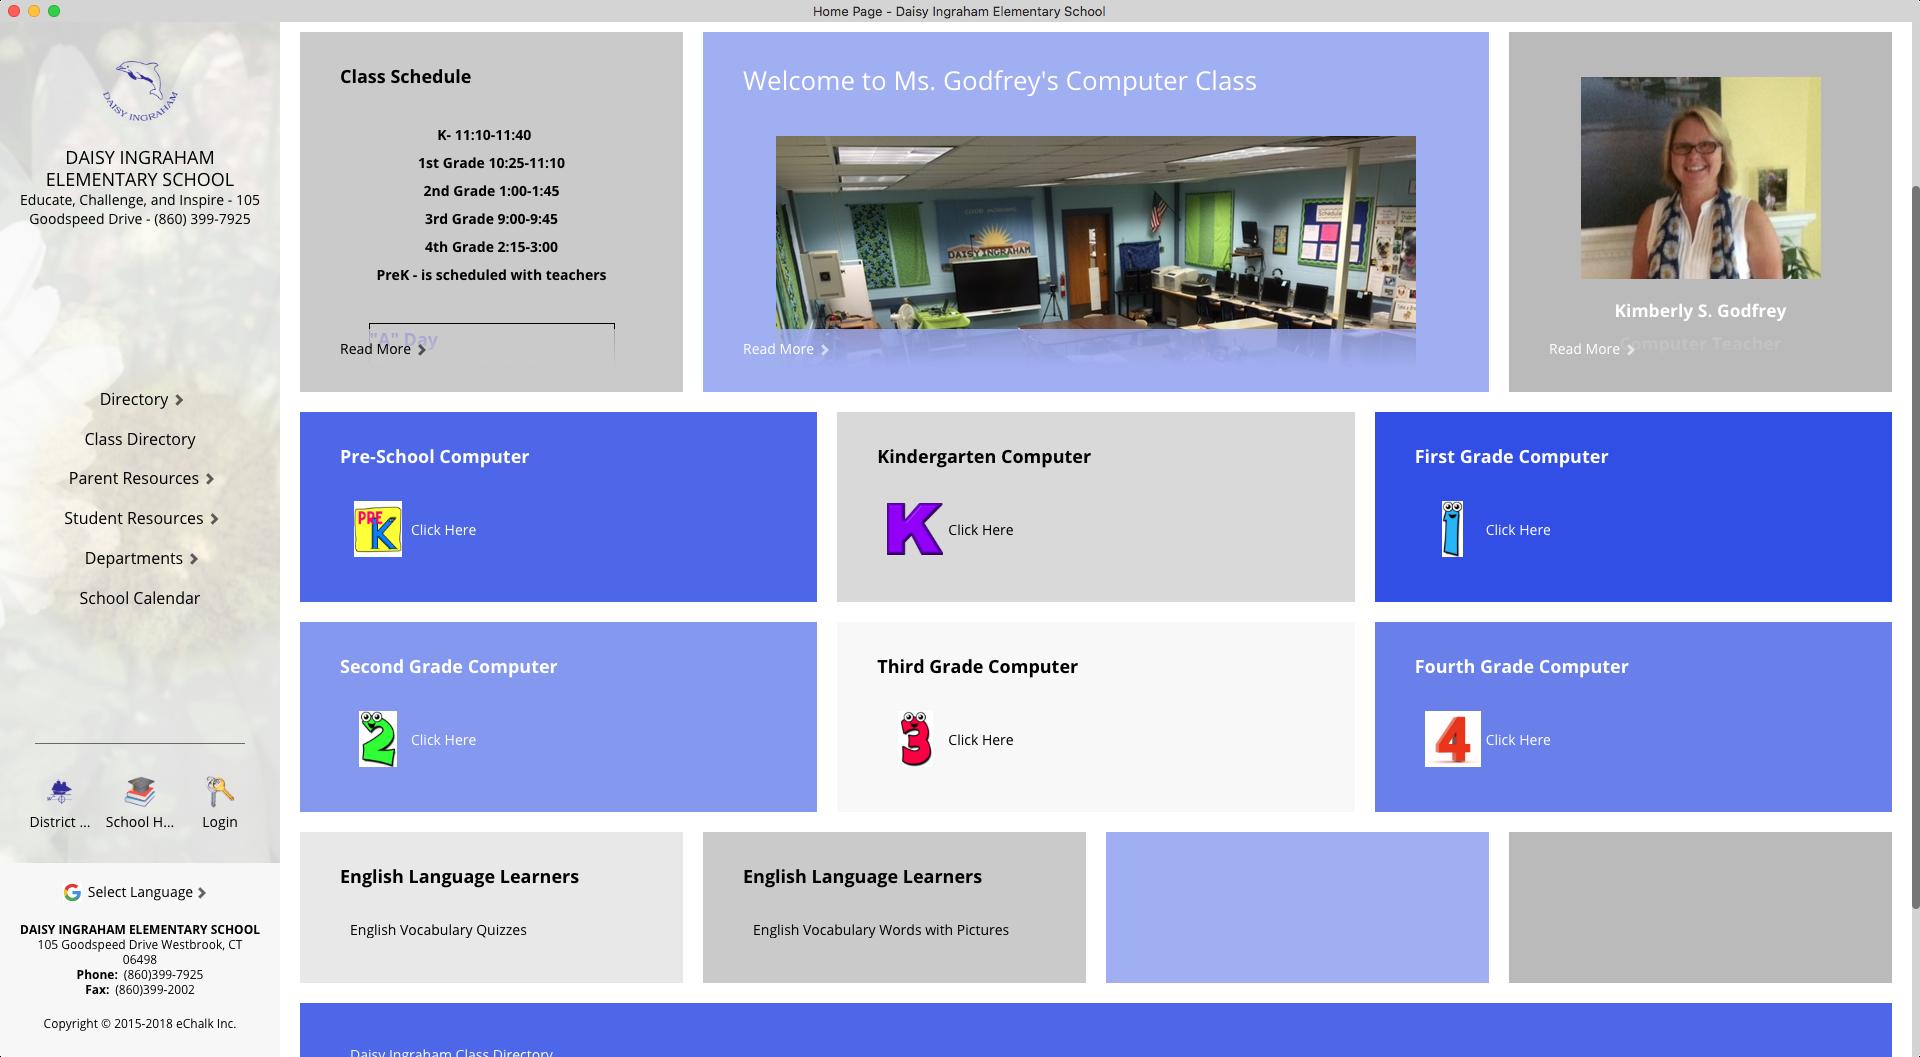 Daisy Ingraham Elementary School Computer Class Webpage